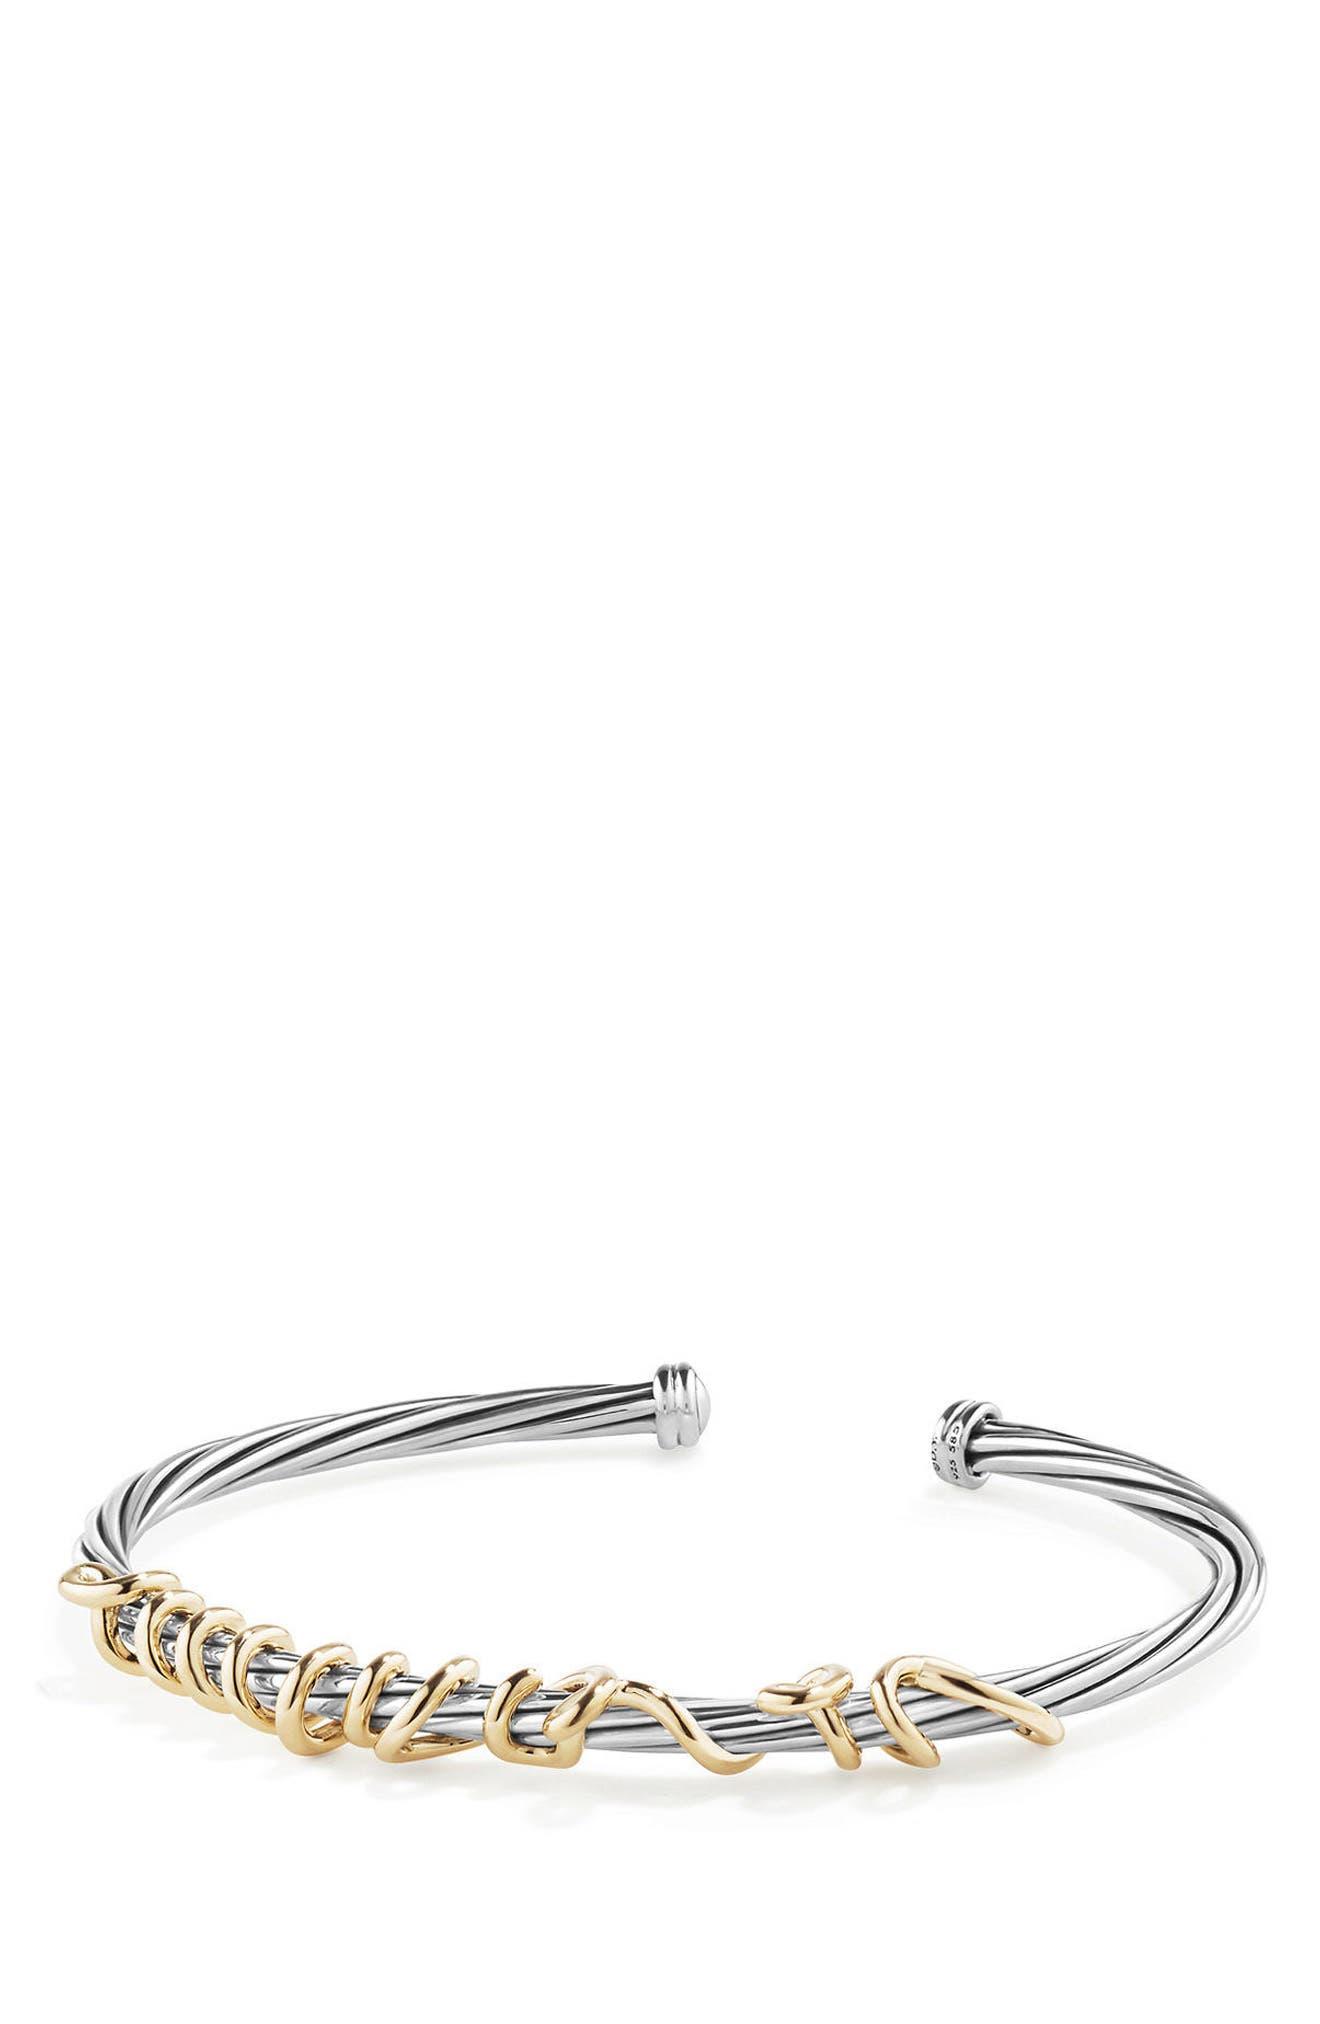 DAVID YURMAN,                             DY Whispers Je T'aime Bracelet with 14k Gold,                             Main thumbnail 1, color,                             040